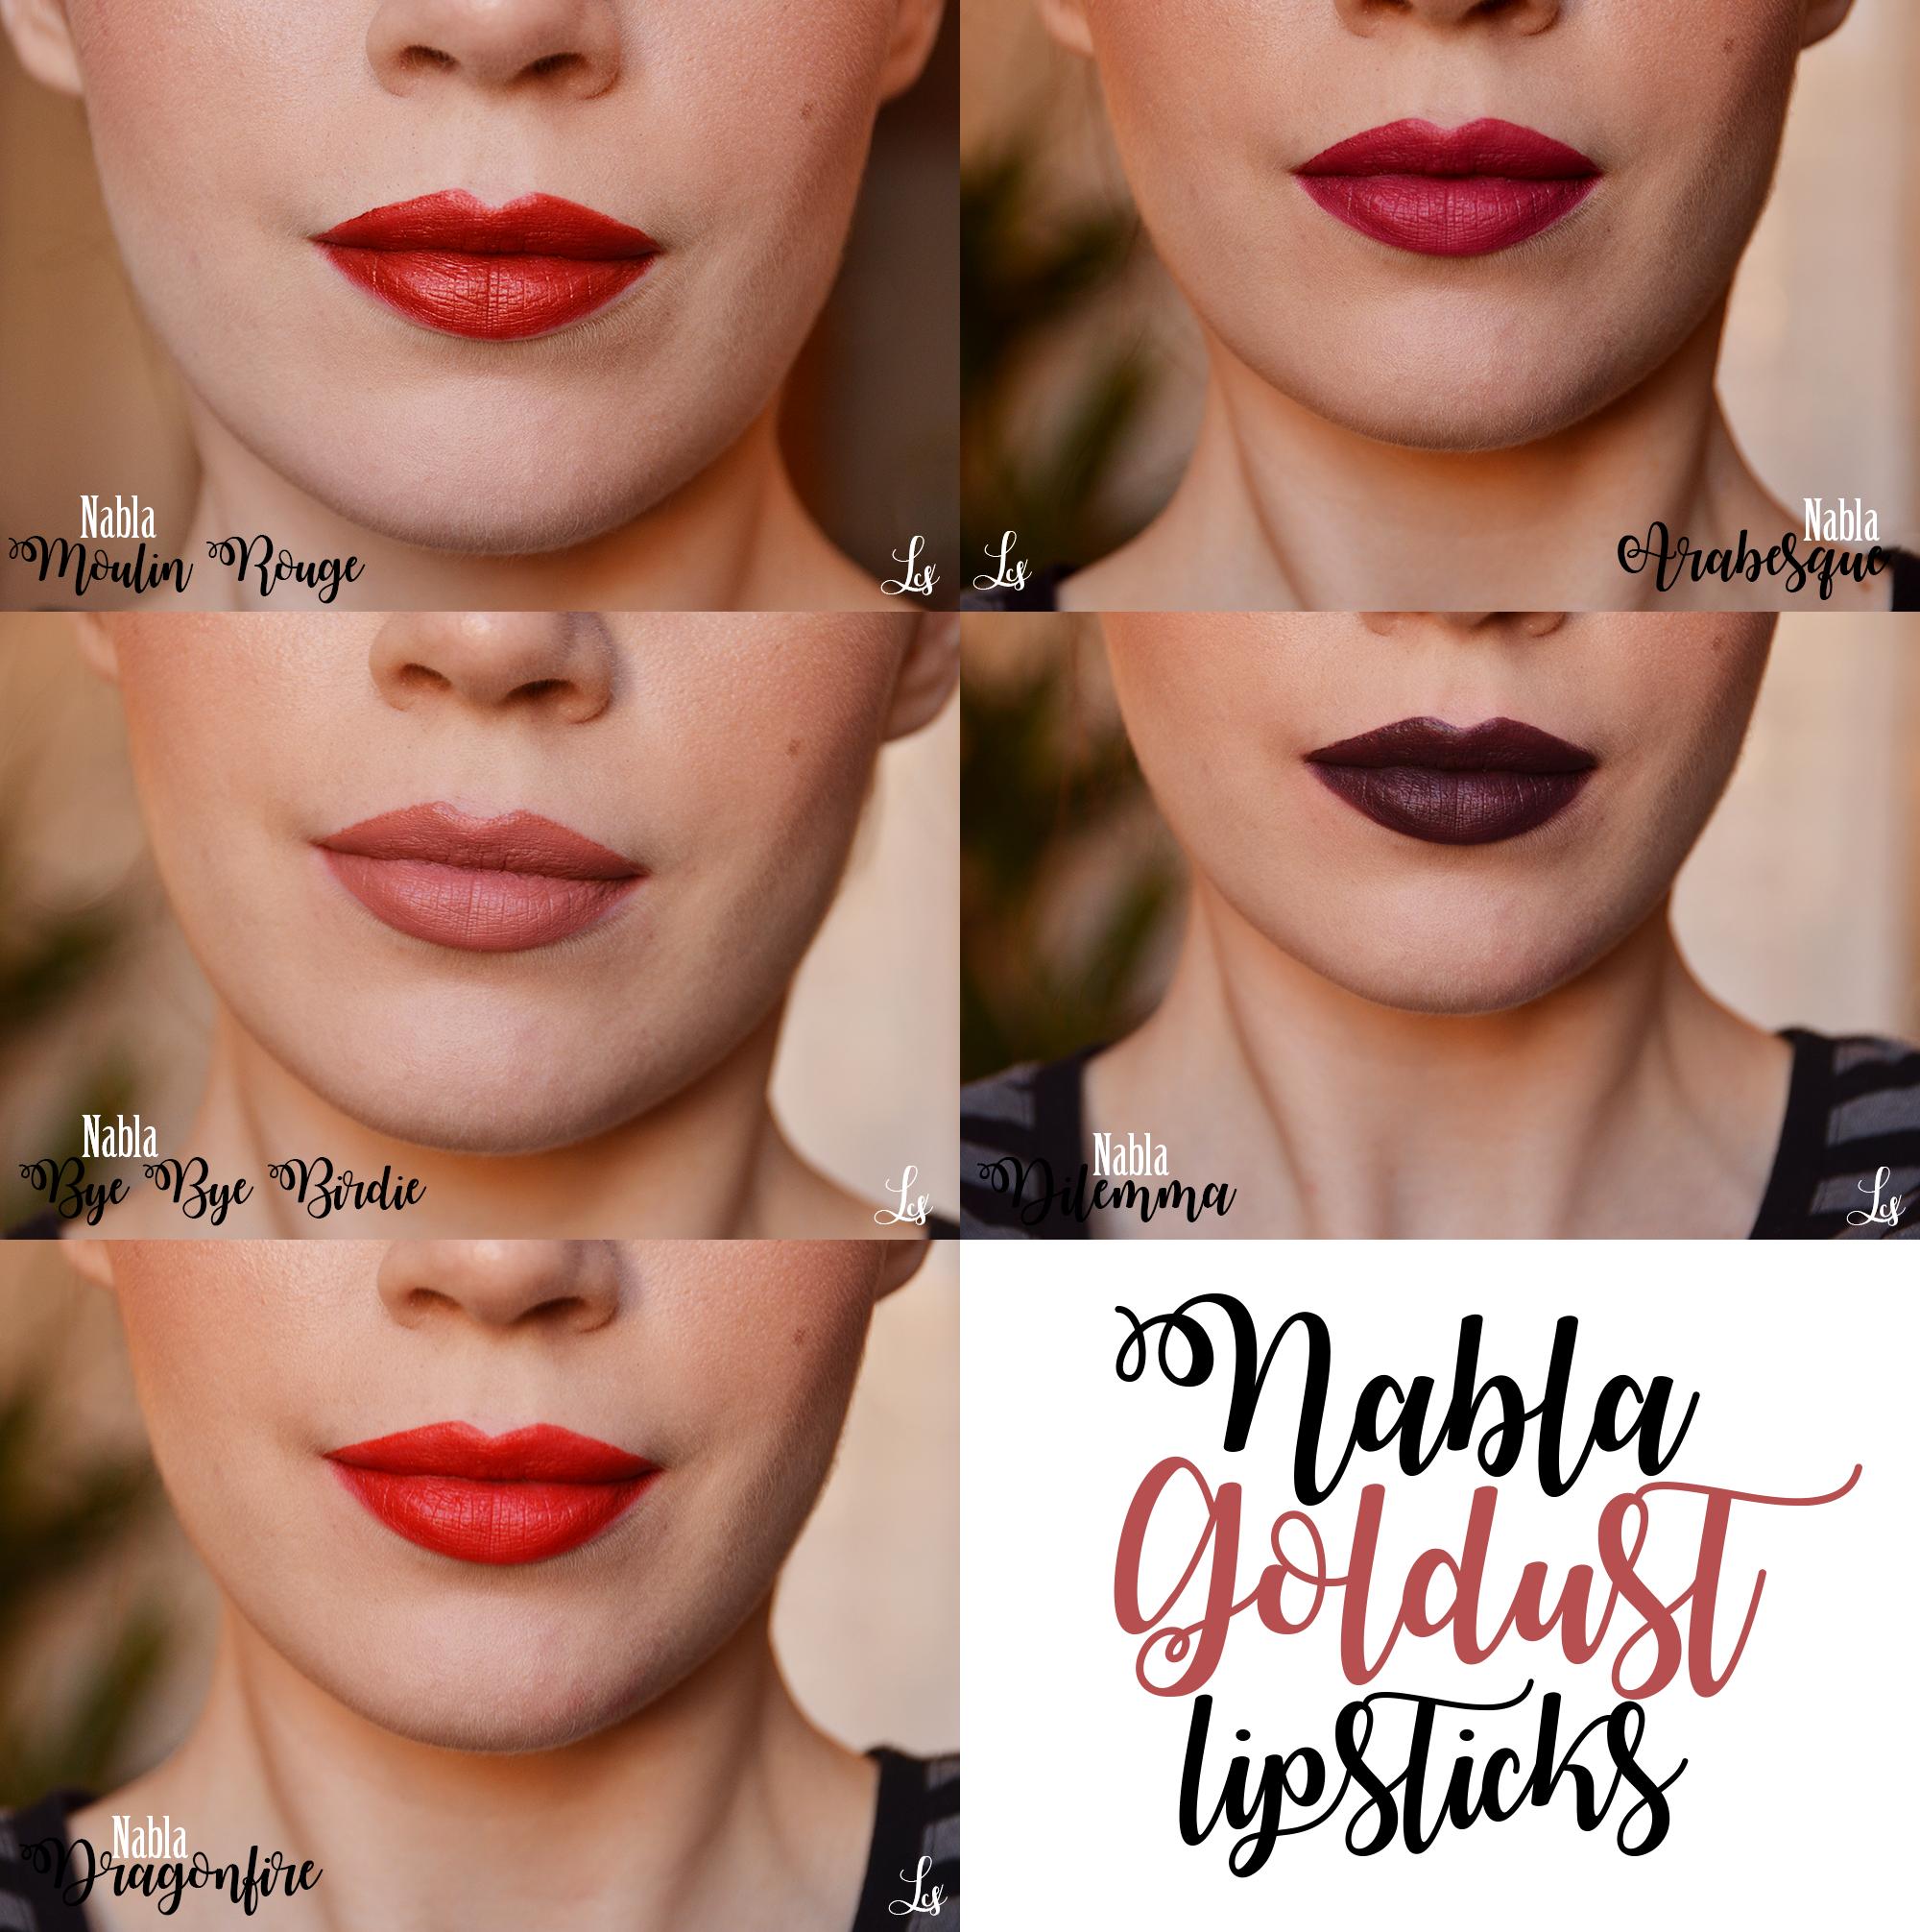 Nabla goldust lipstick swatches make up swatches nel 2019 - Diva crime closer ...